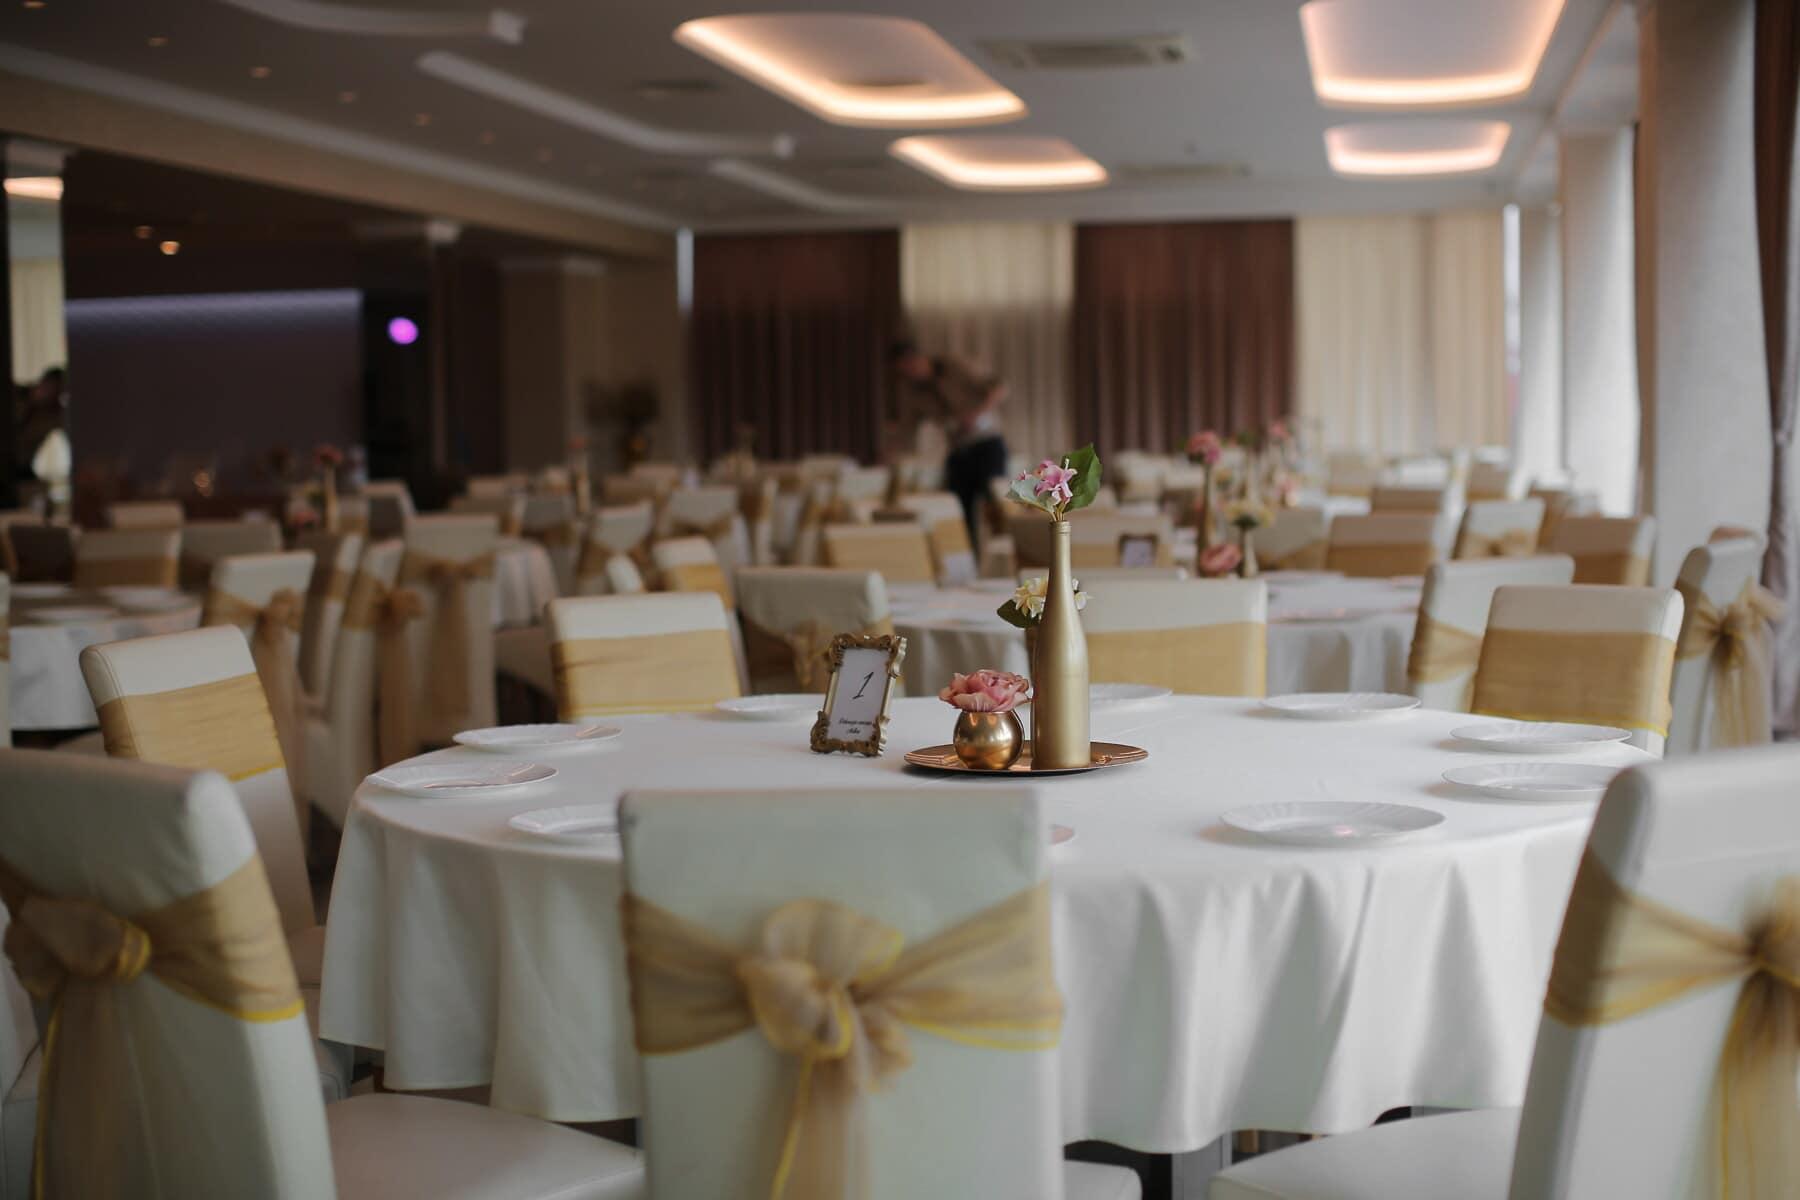 hotel, lunchroom, dining area, golden glow, wedding venue, luxury, indoors, interior design, table, restaurant